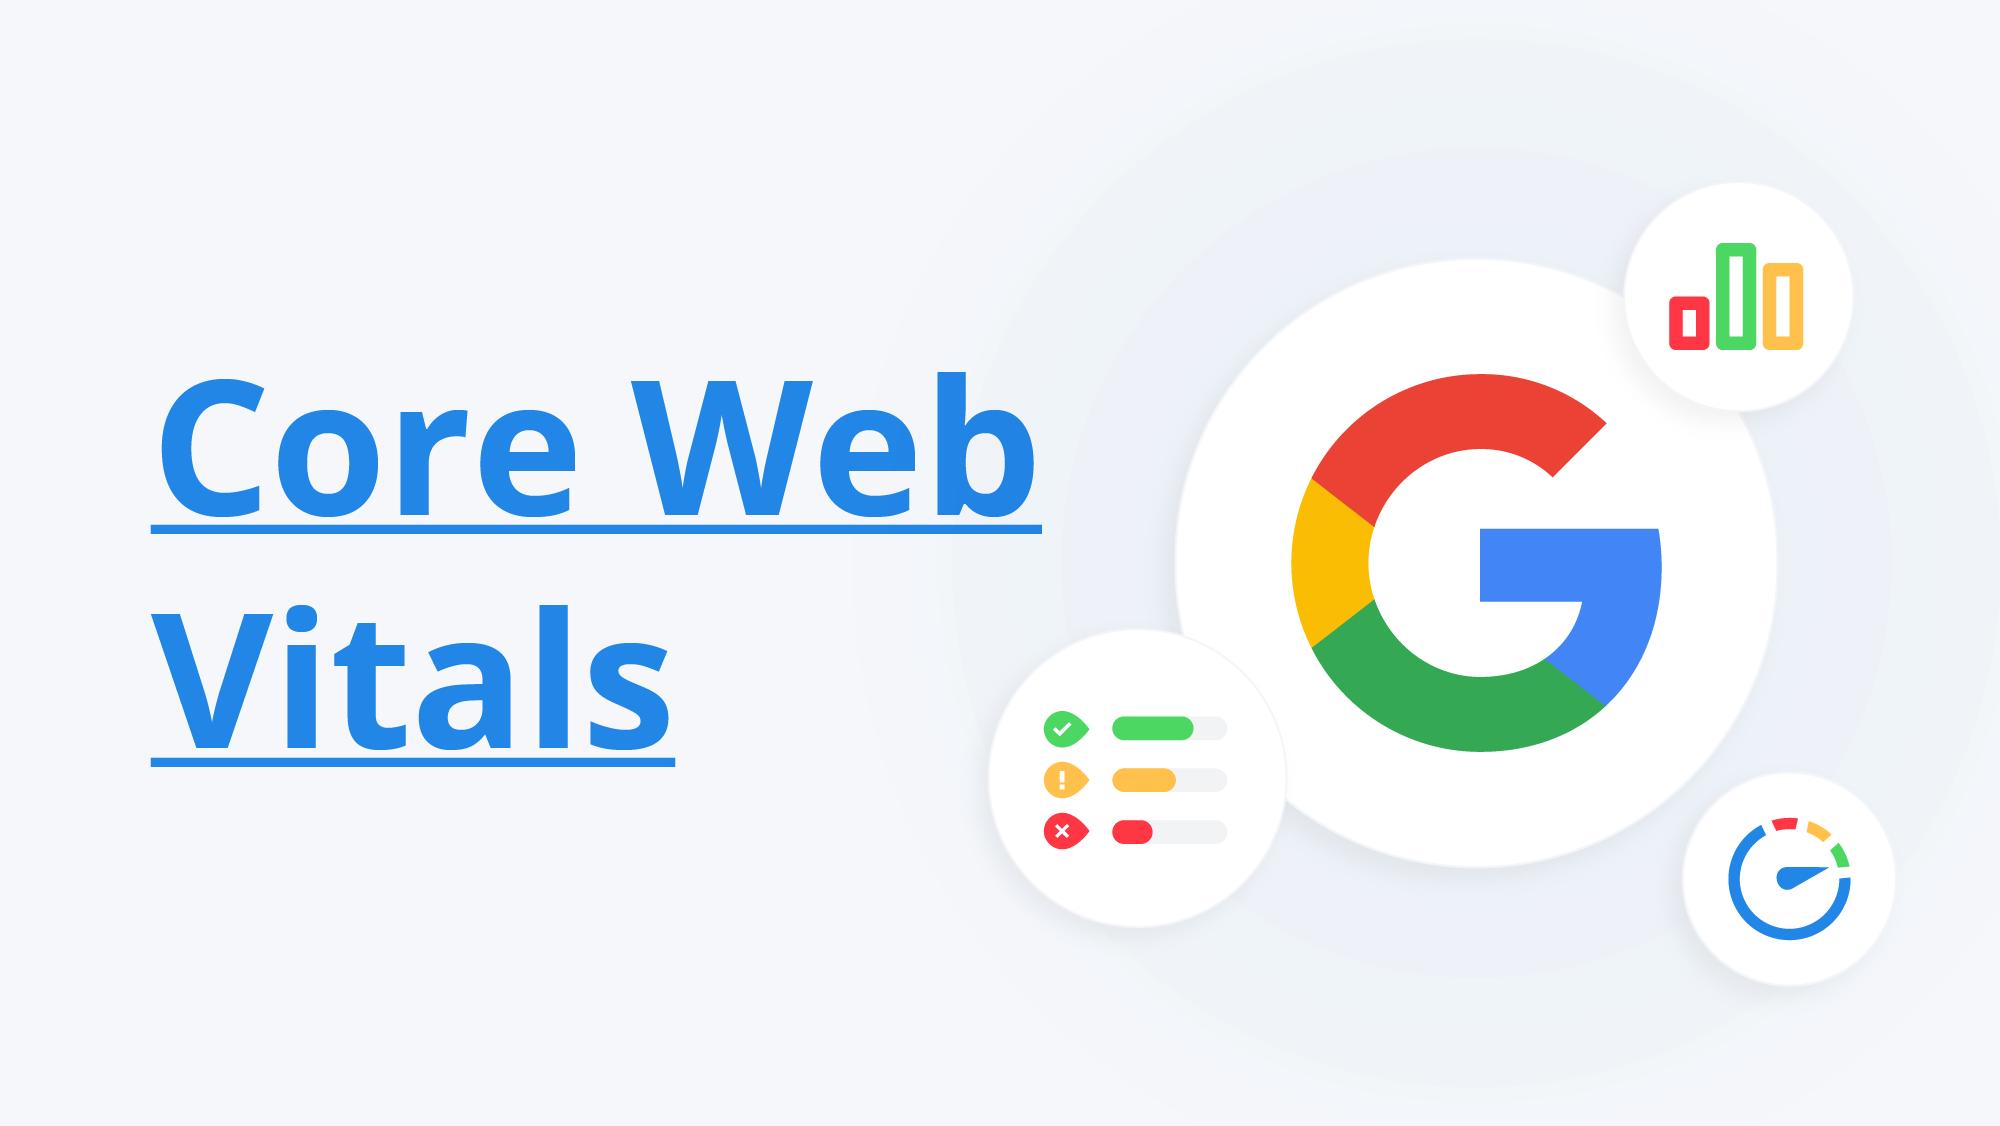 Core Web Vitals article